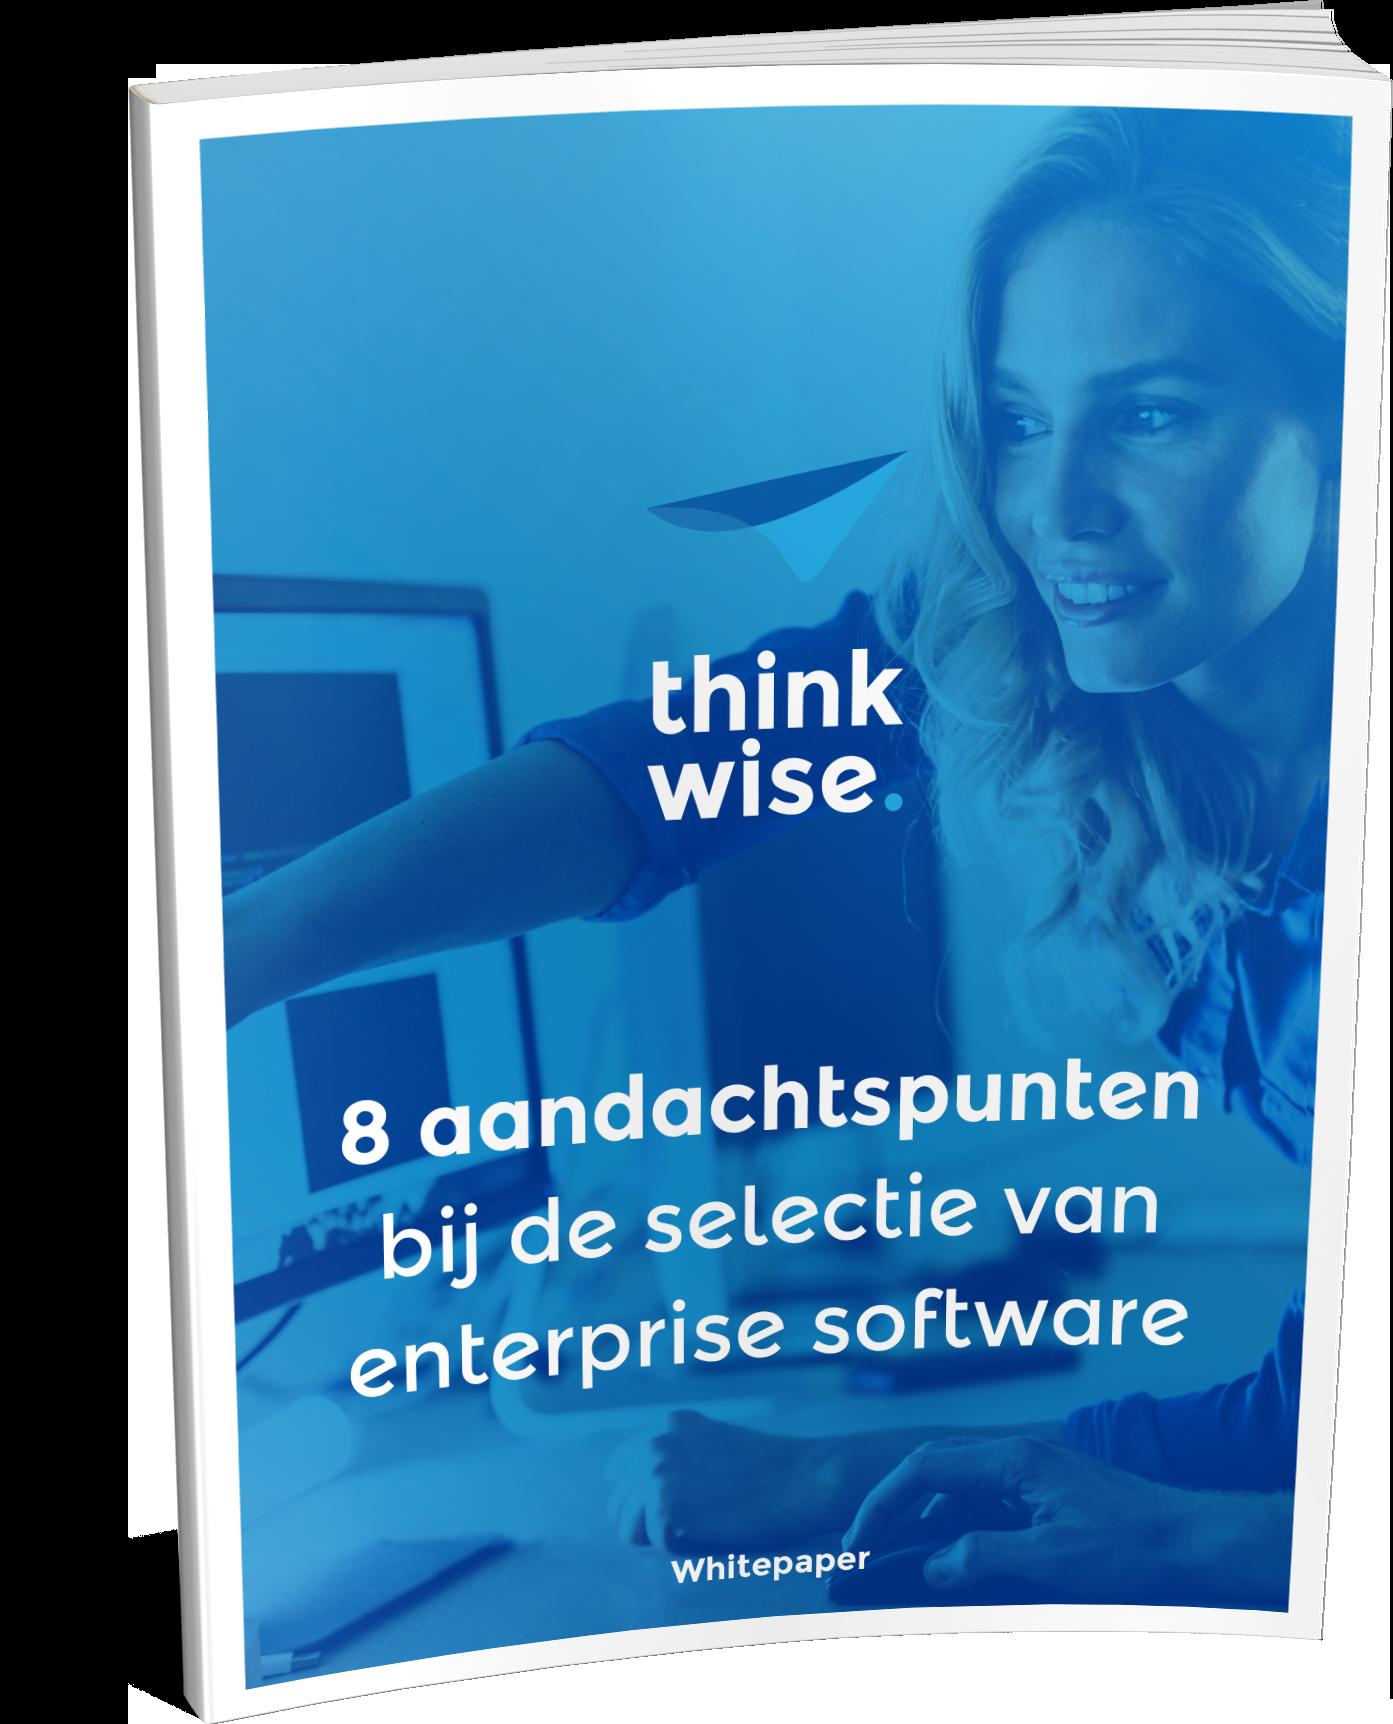 8 aandachtspunten-lp-nl-cover.png